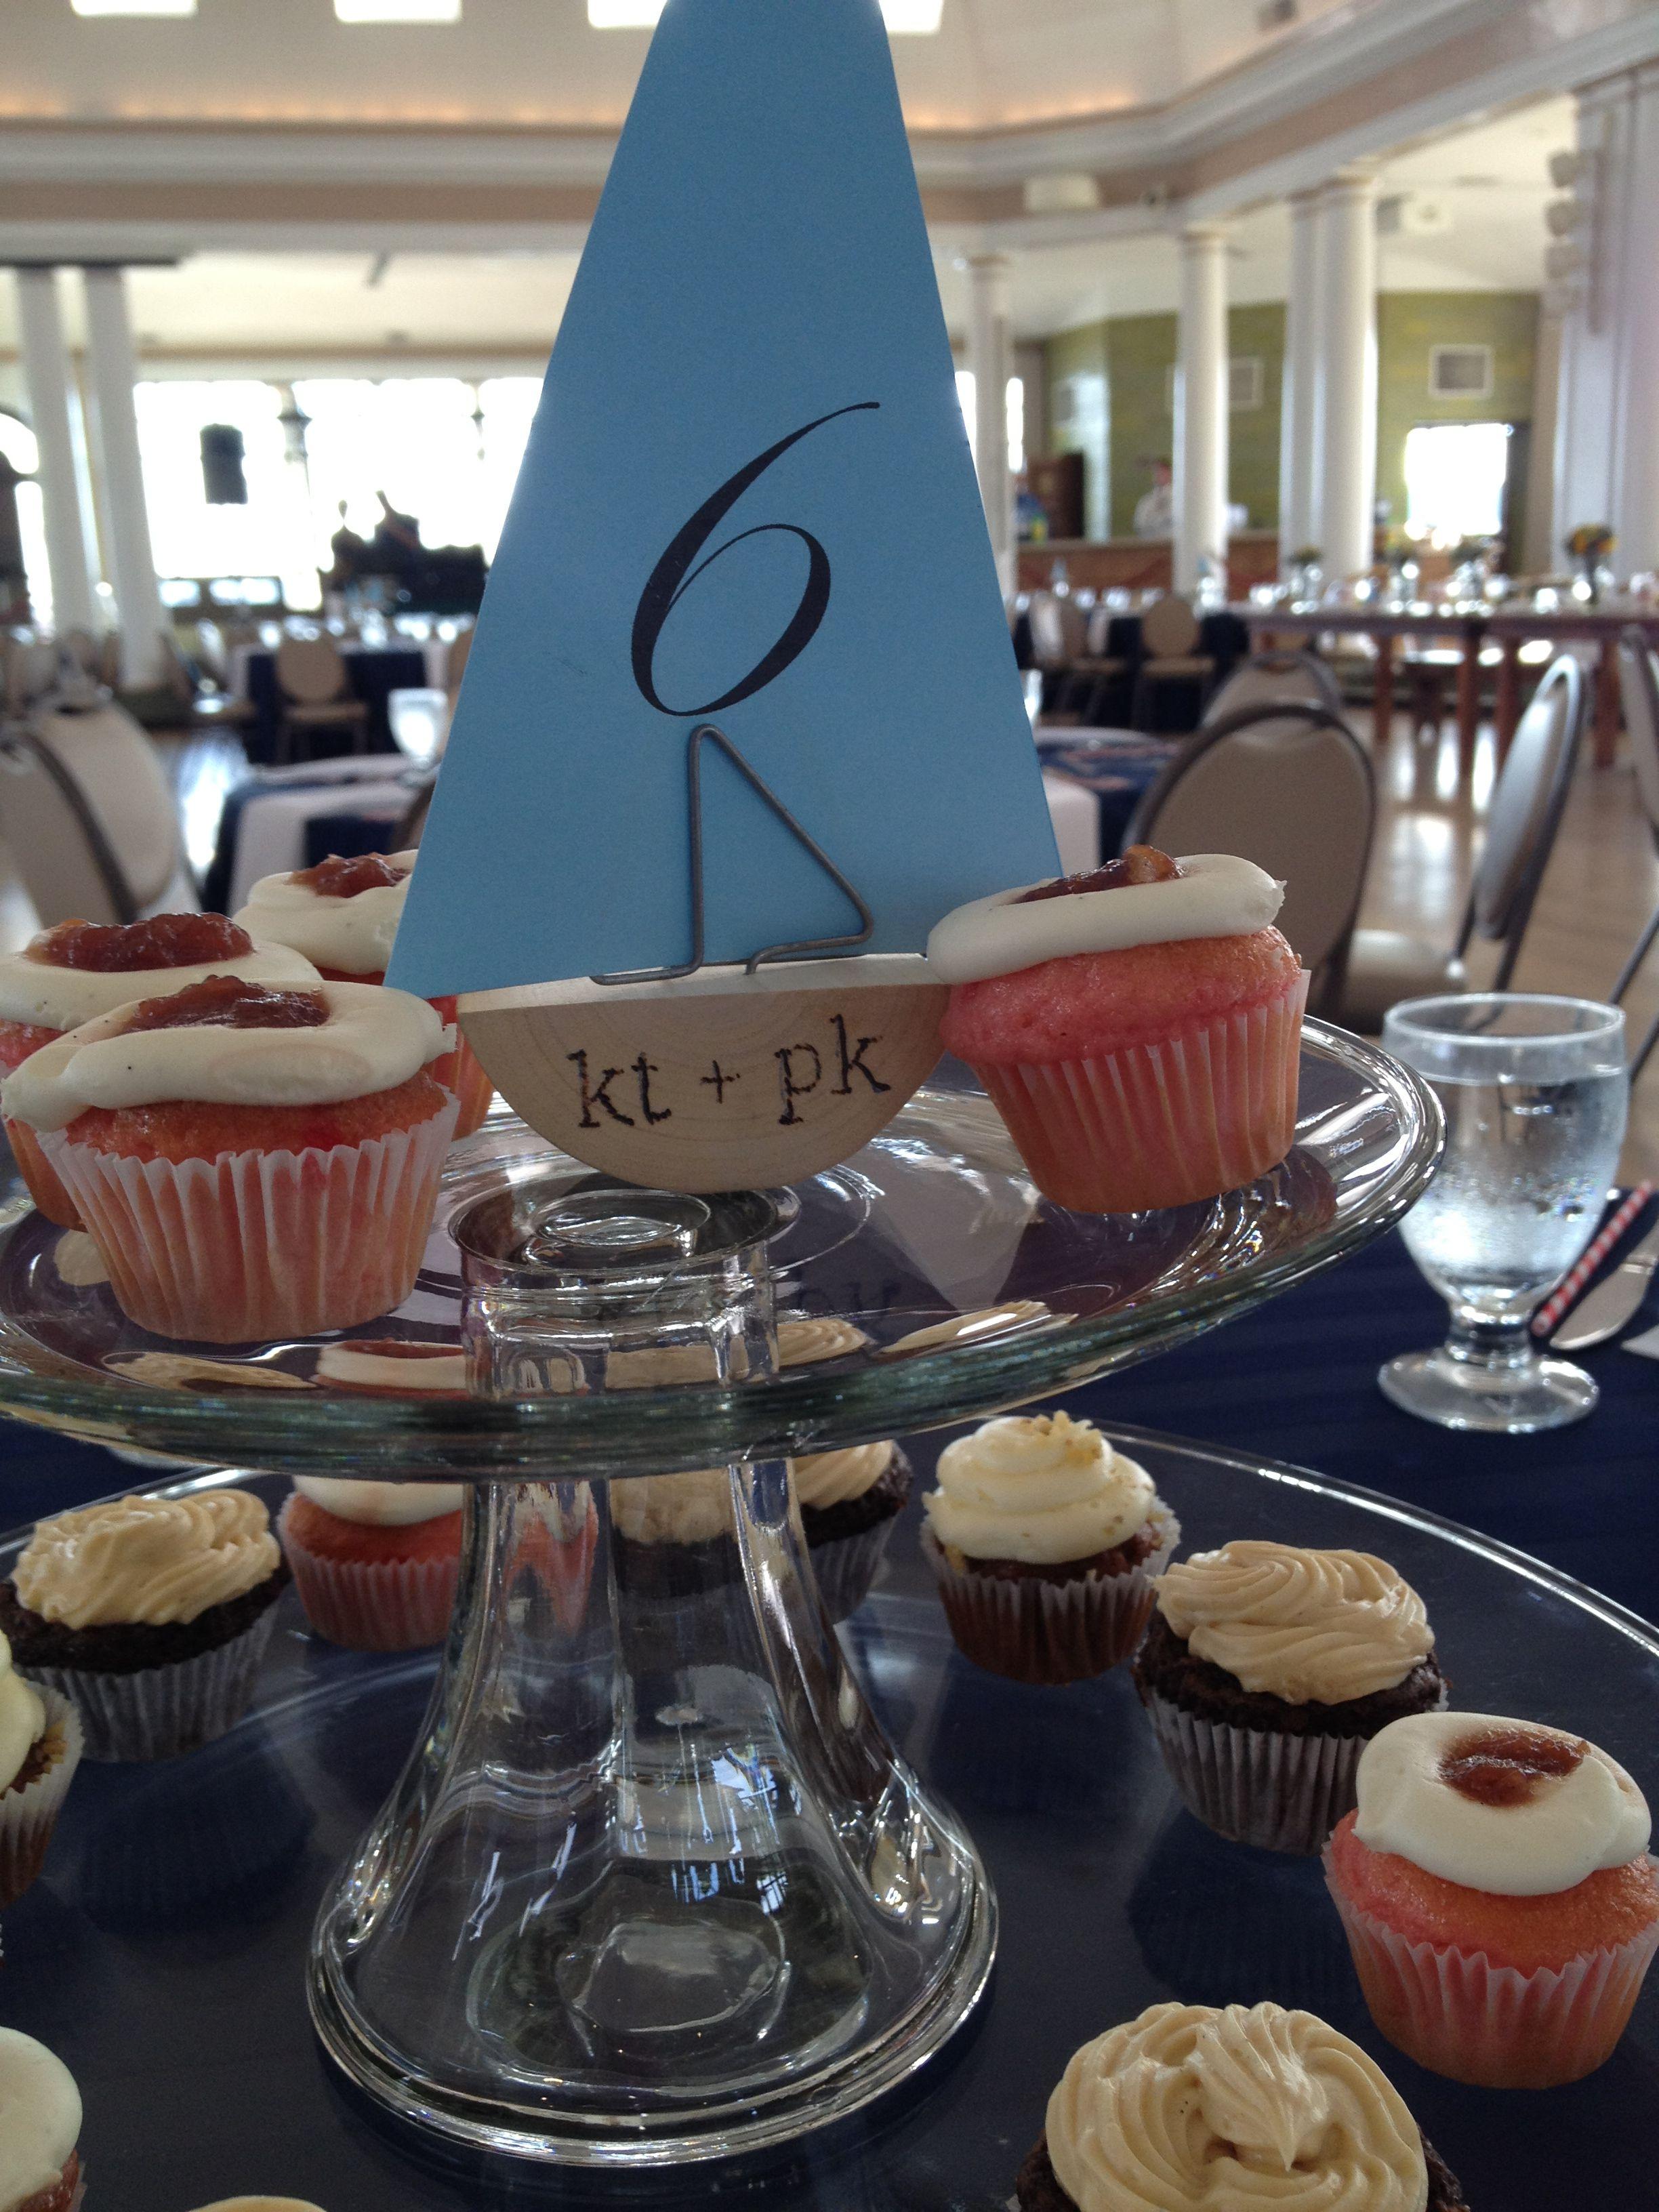 Custom boat table number holders for @Katie Hayden's nautical wedding reception.